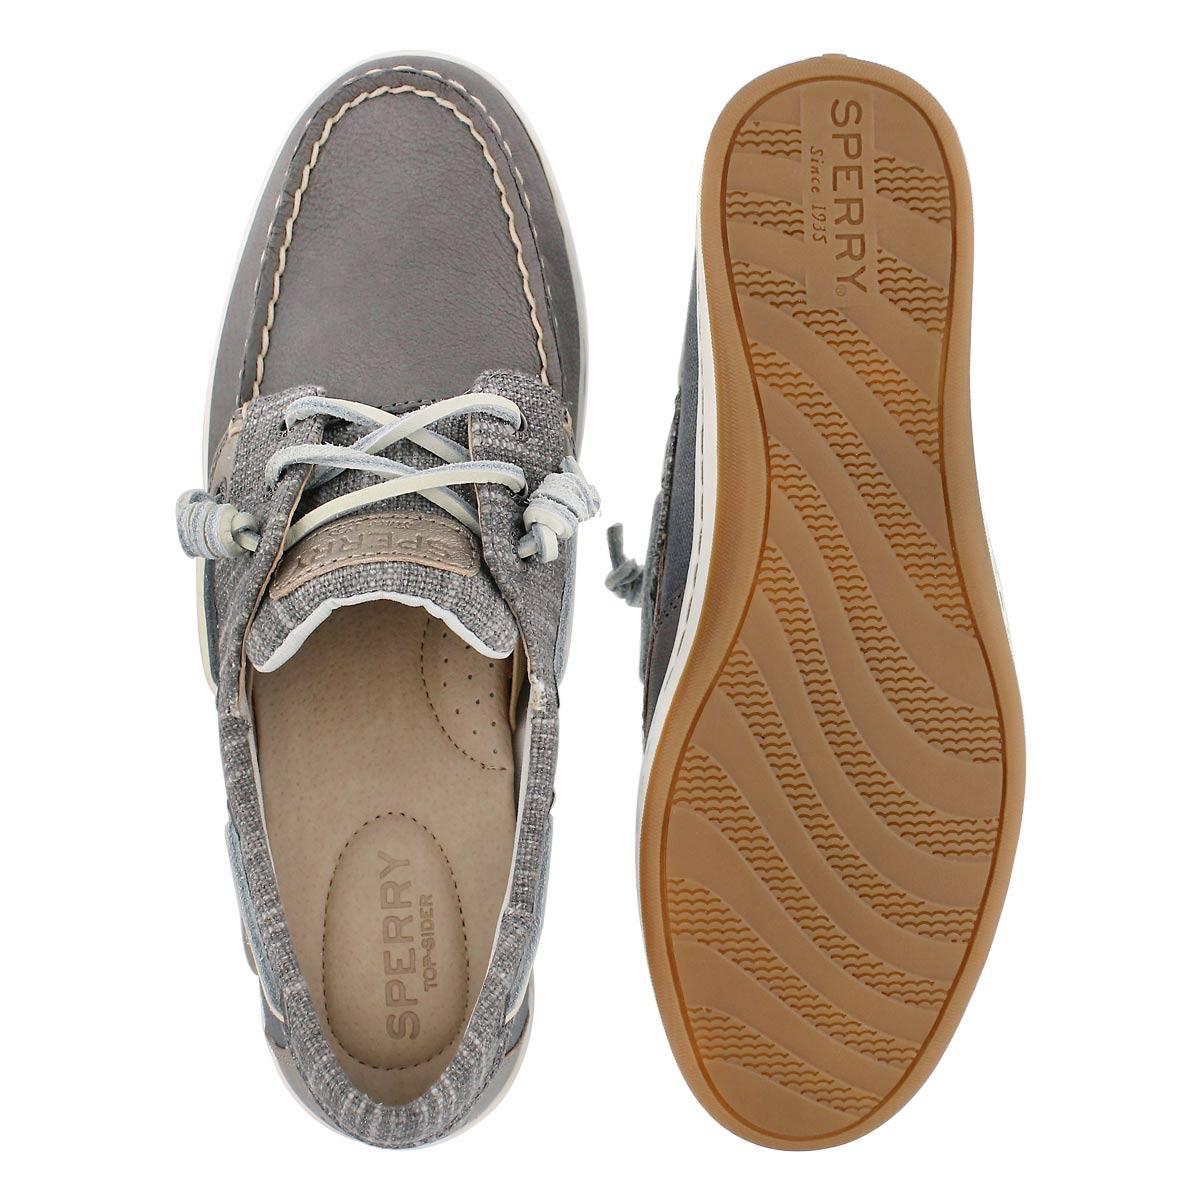 Lds Songfish Metallic Sparkle gry shoe